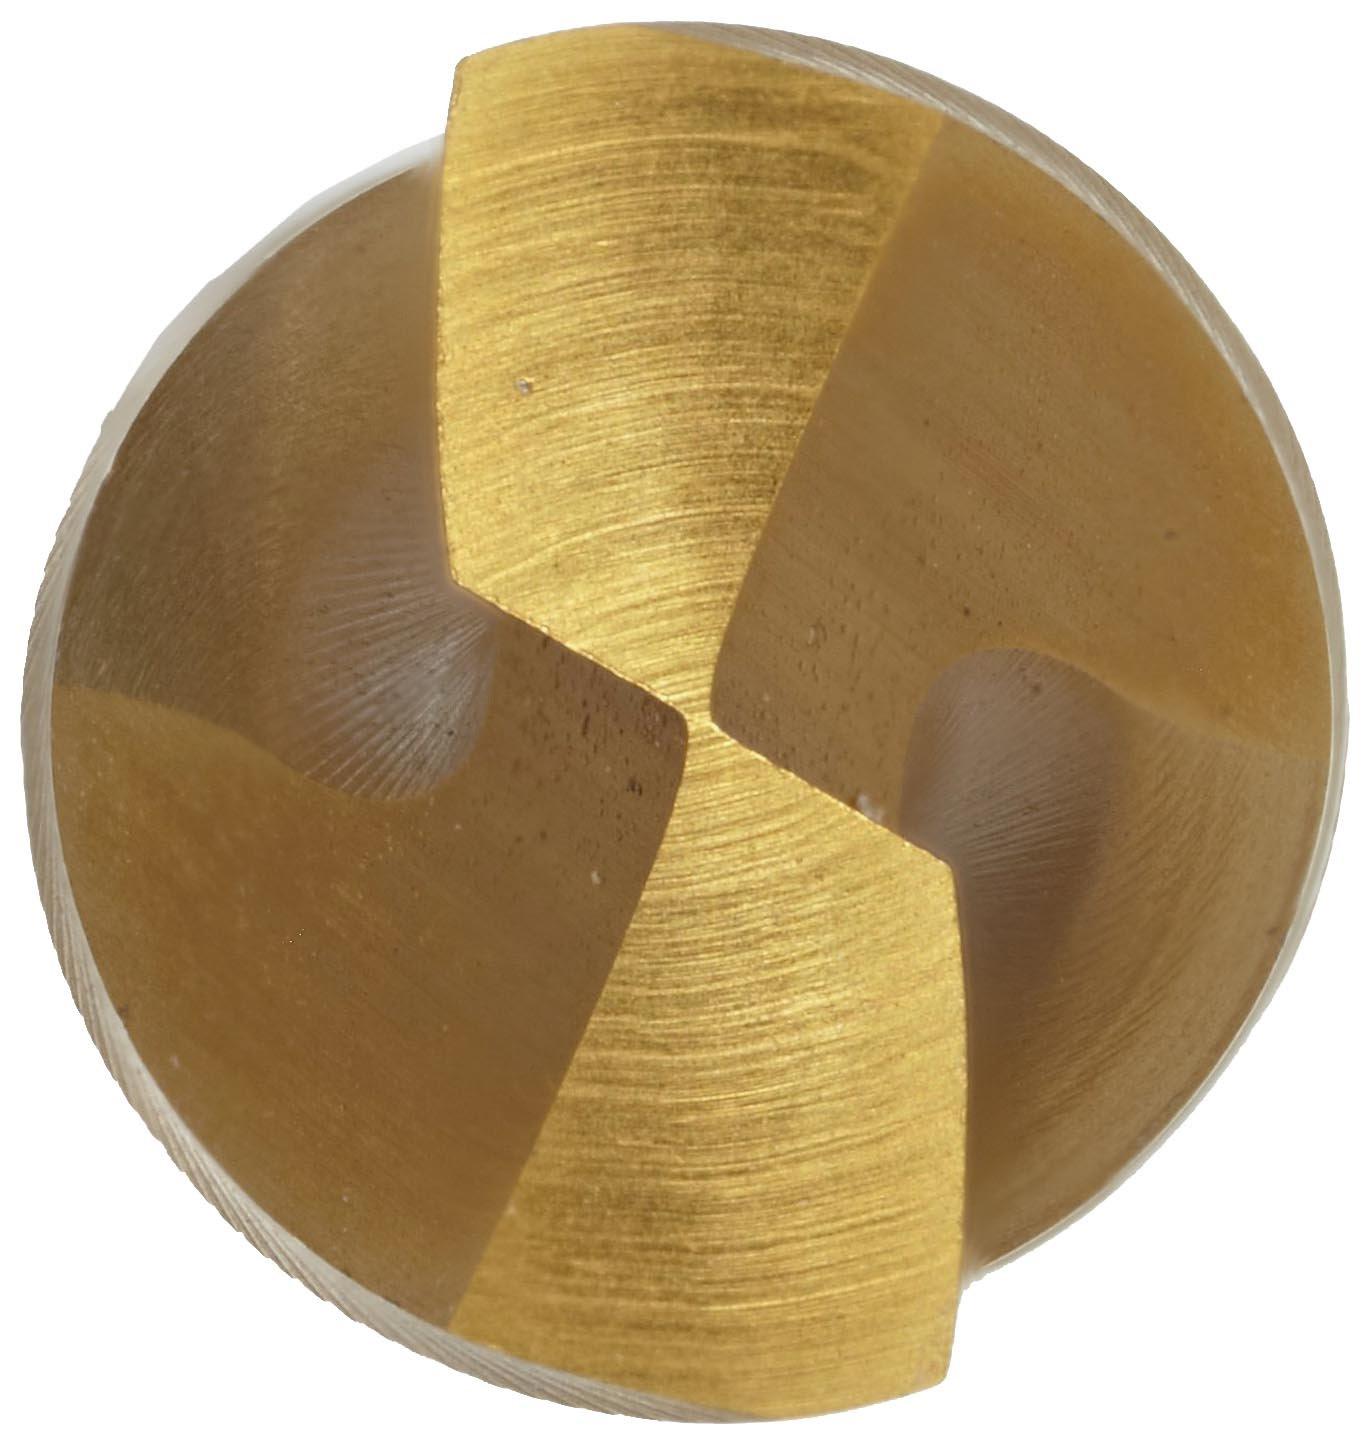 19//64 Pack of 1 135 Degree Radius Split Point Precision Twist QC41G High Speed Steel Short Length Drill Bit TiN Coated Round Shank Parabolic Flute